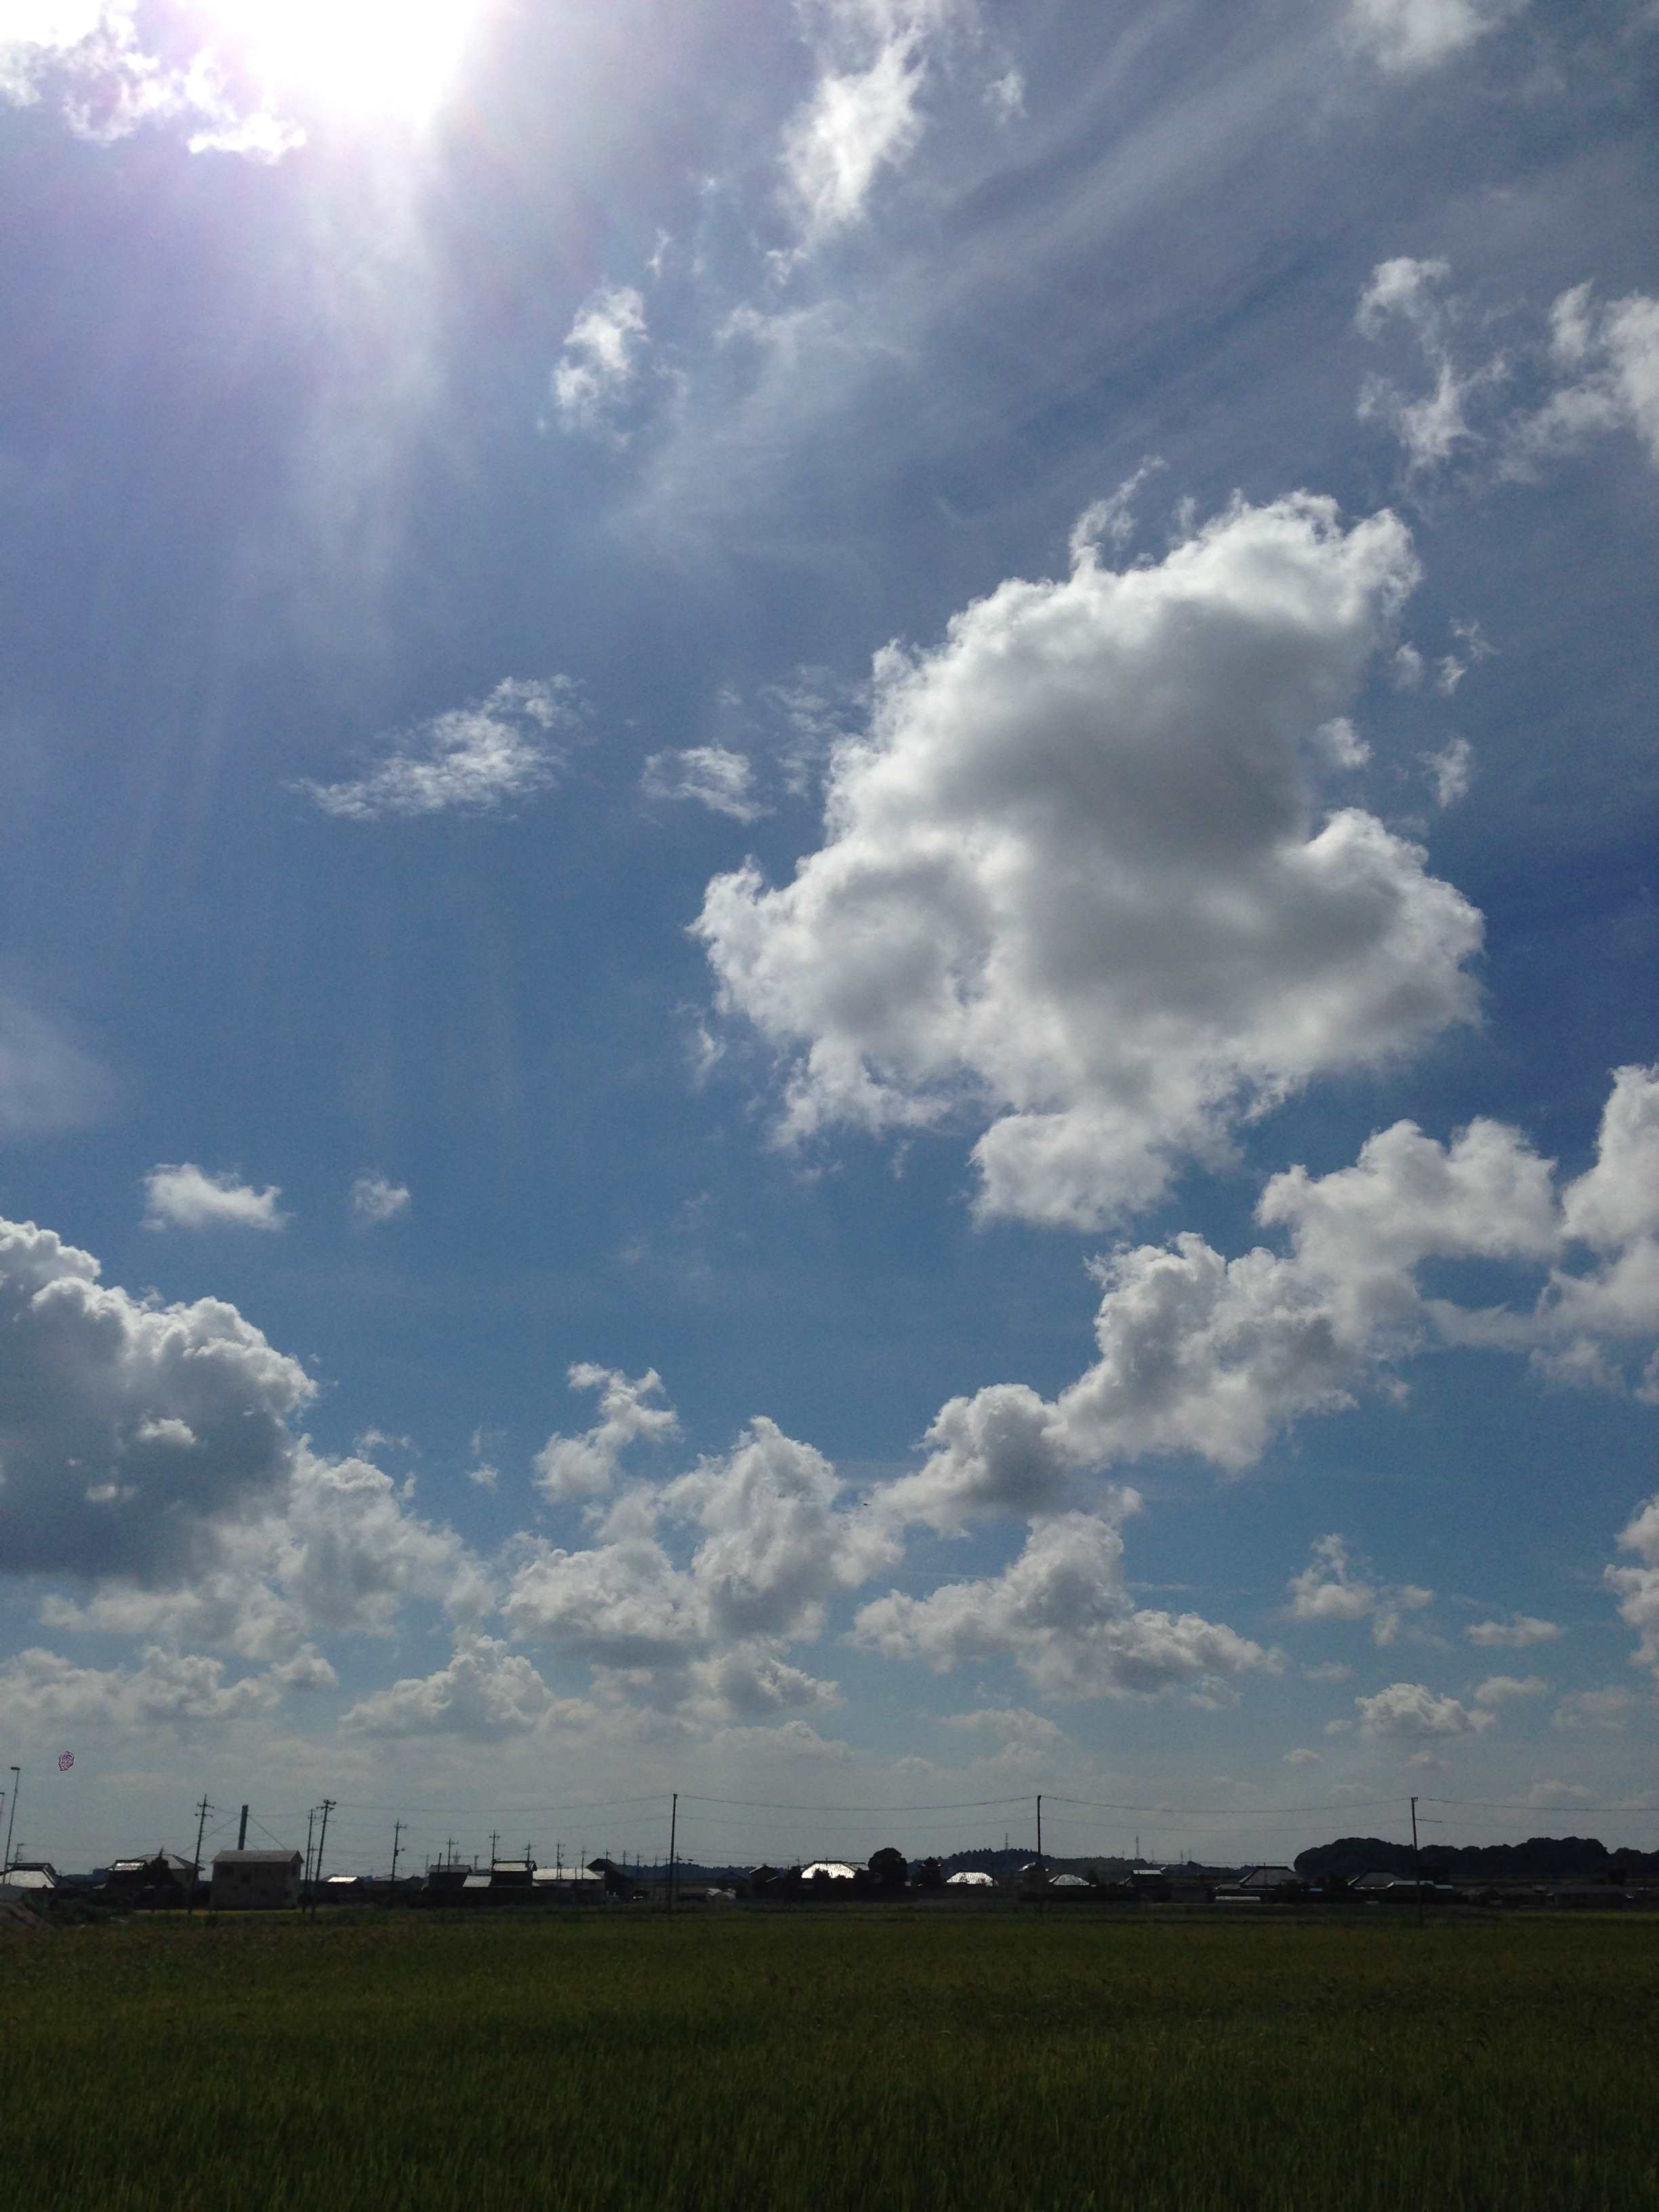 2014-09-21 10.12.48_R.jpg